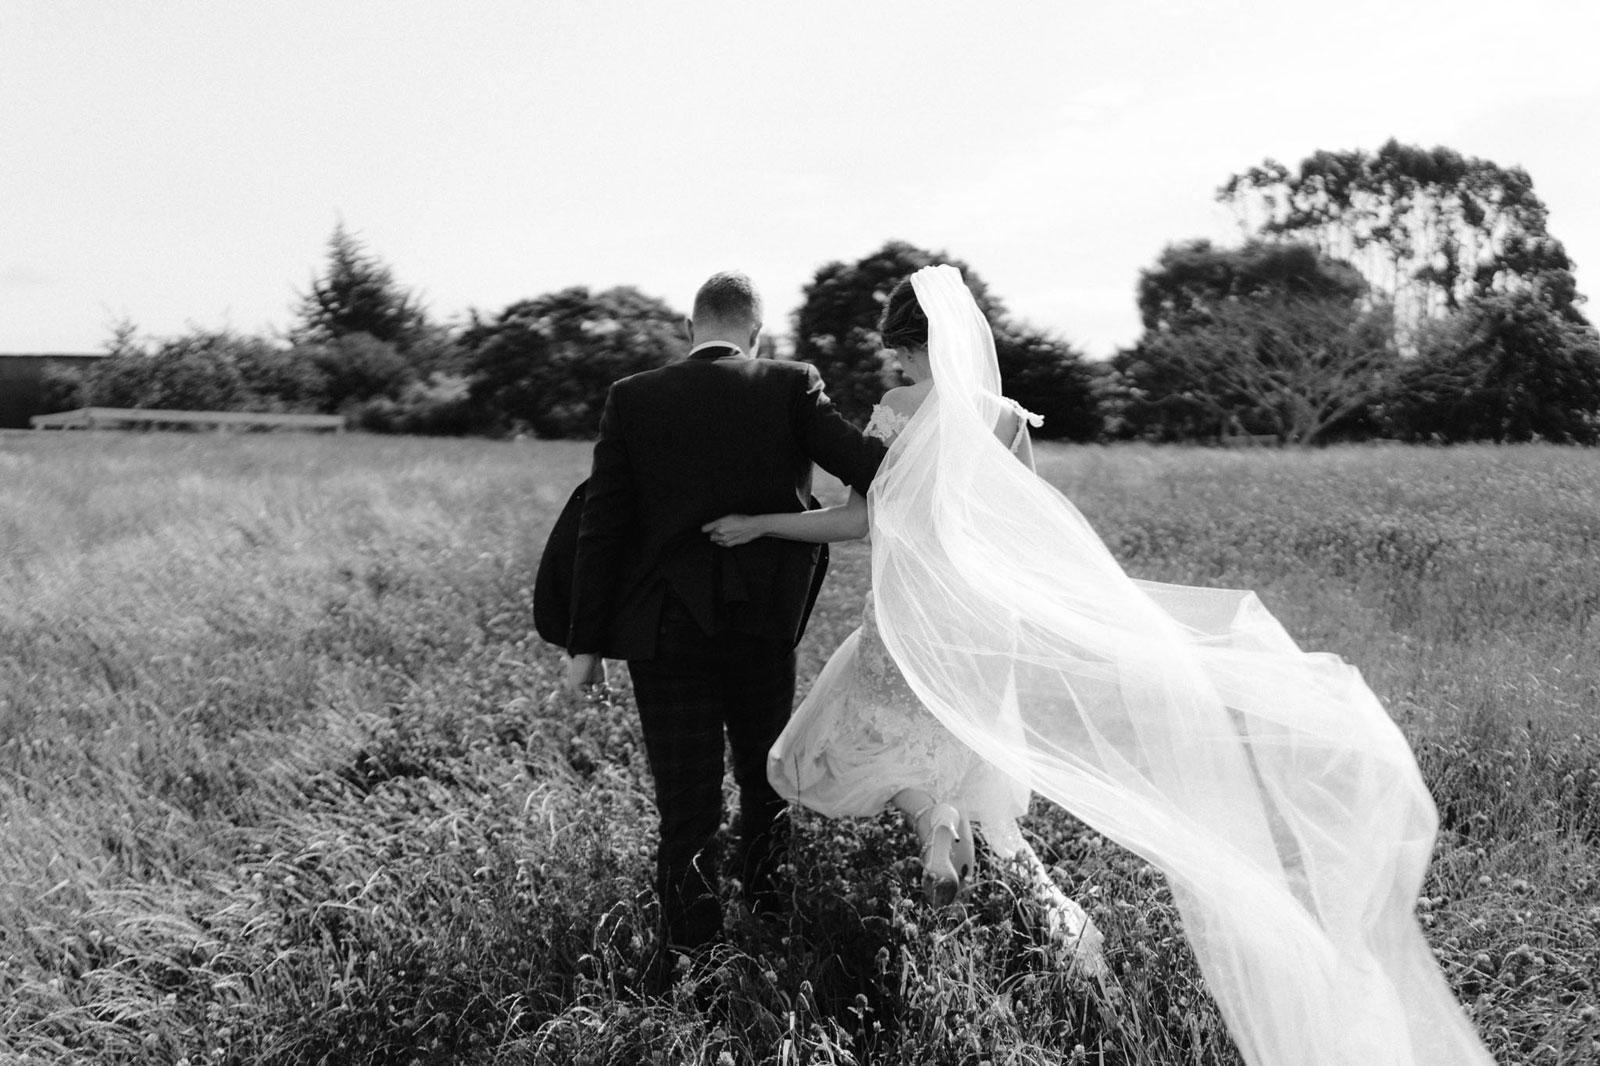 newfound-n-c-olive-tree-cottage-tauranga-wedding-photographer-742A